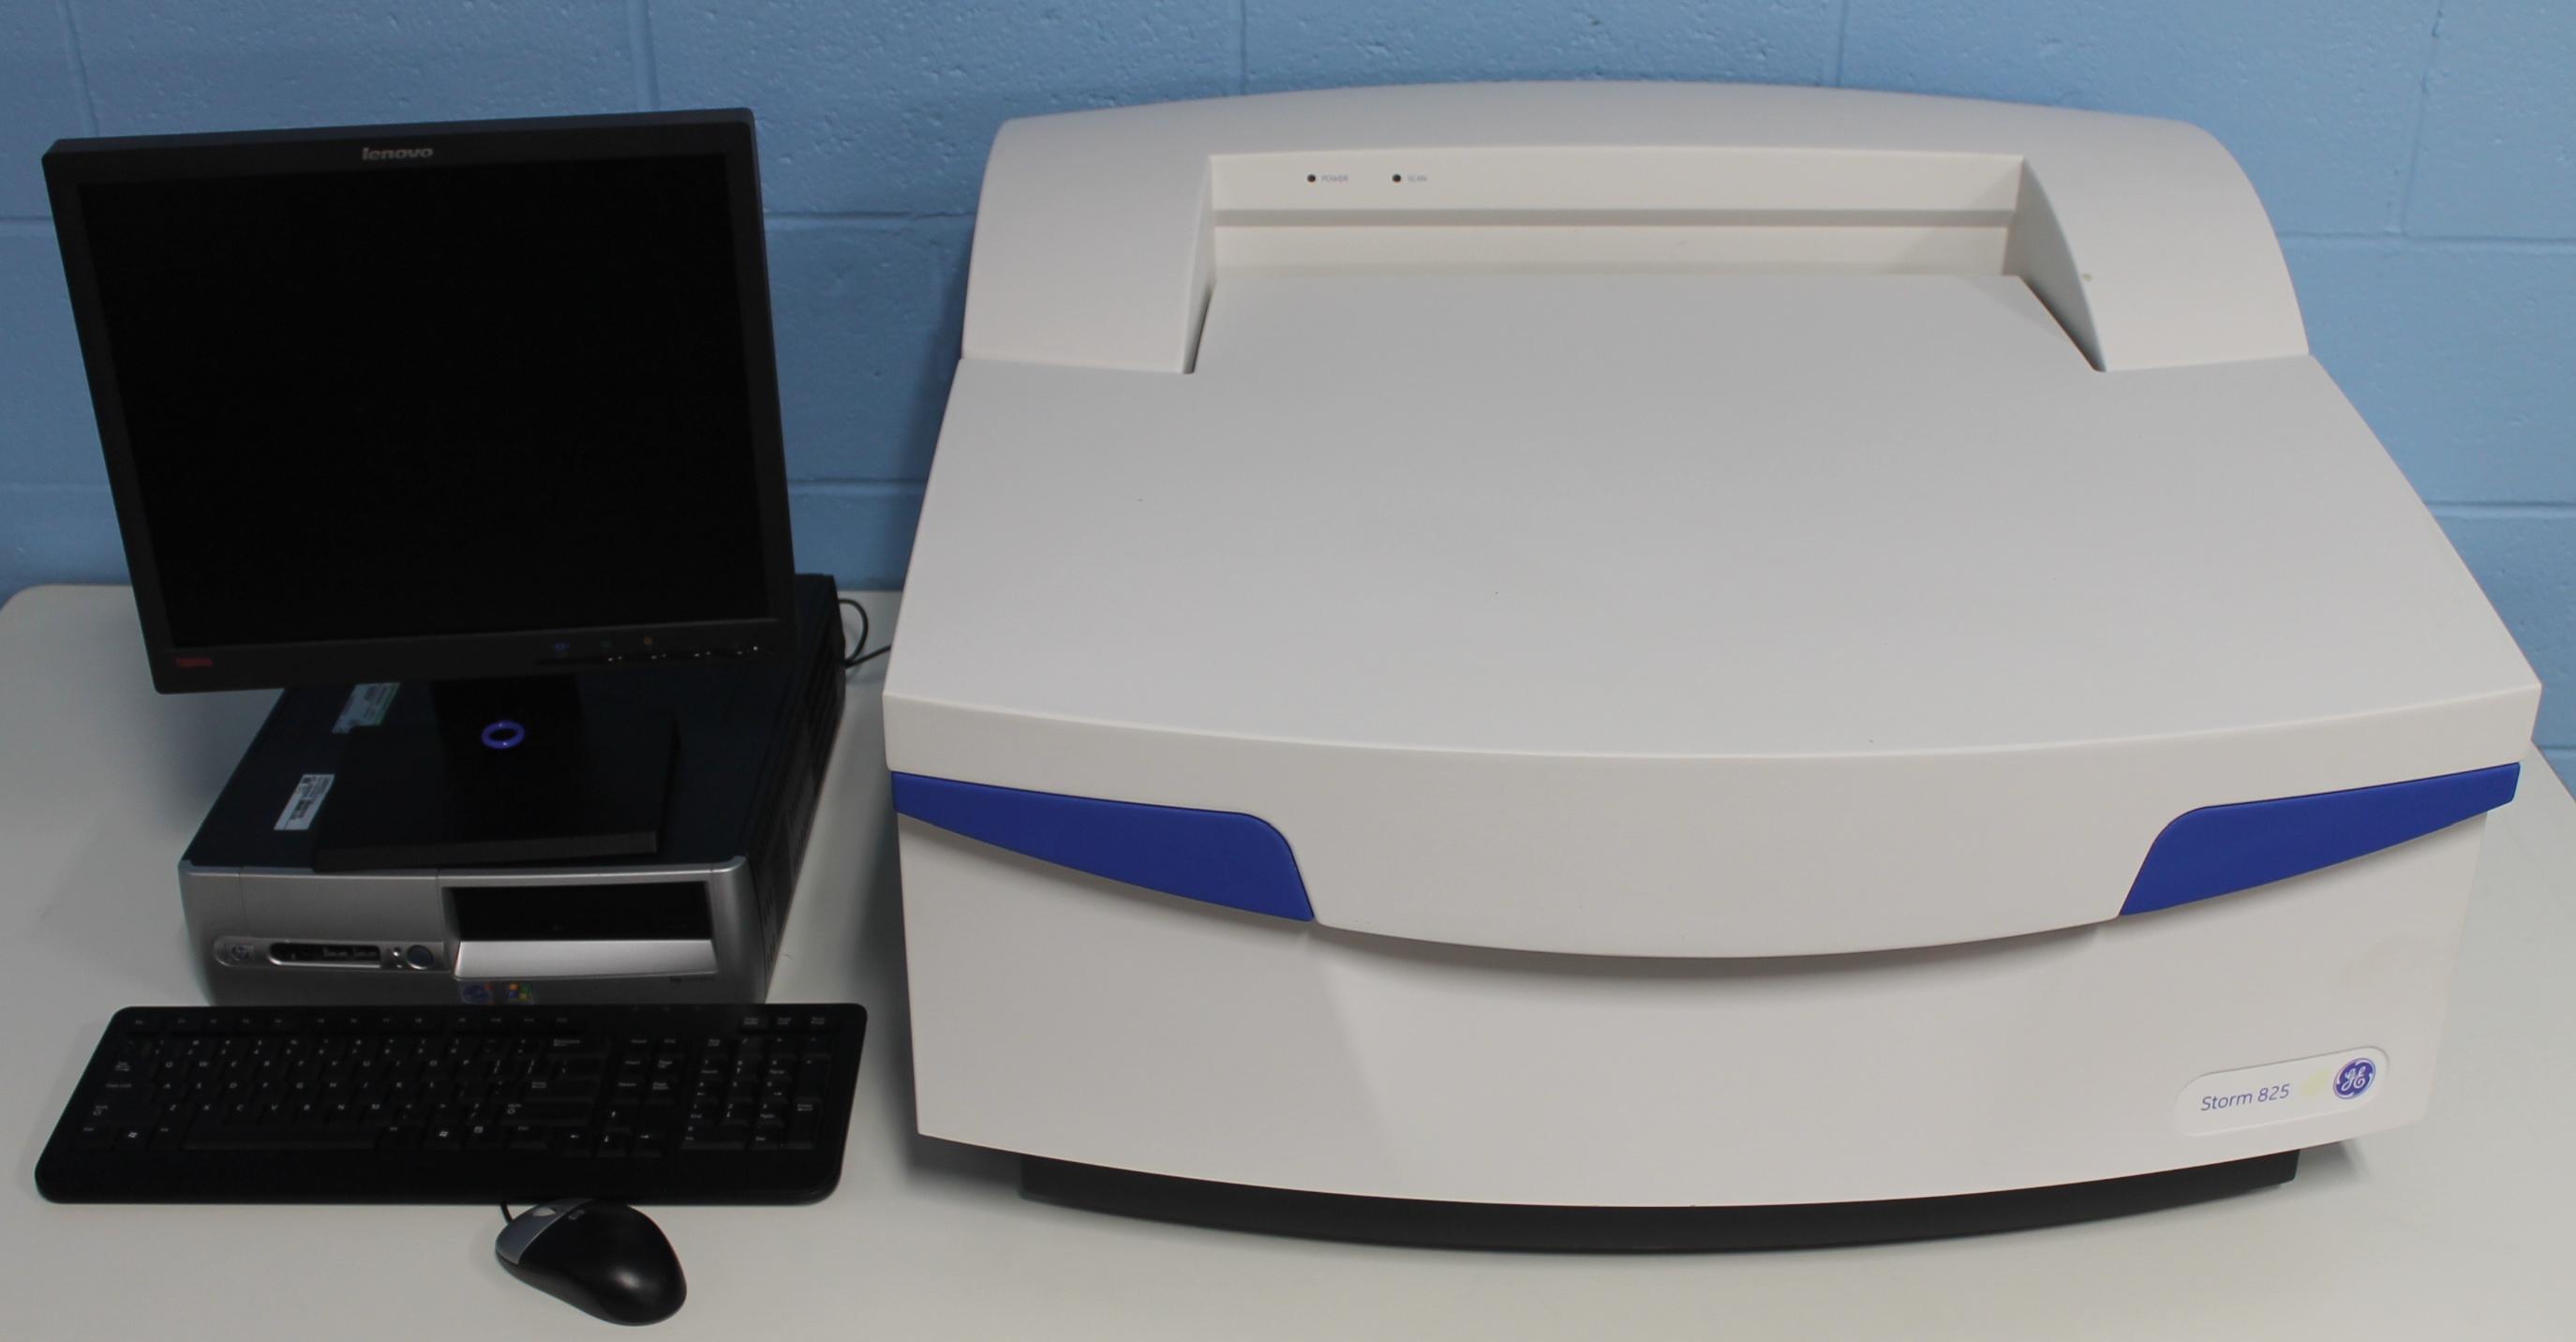 Refurbished Ge Healthcare Life Sciences Storm 825 Imaging